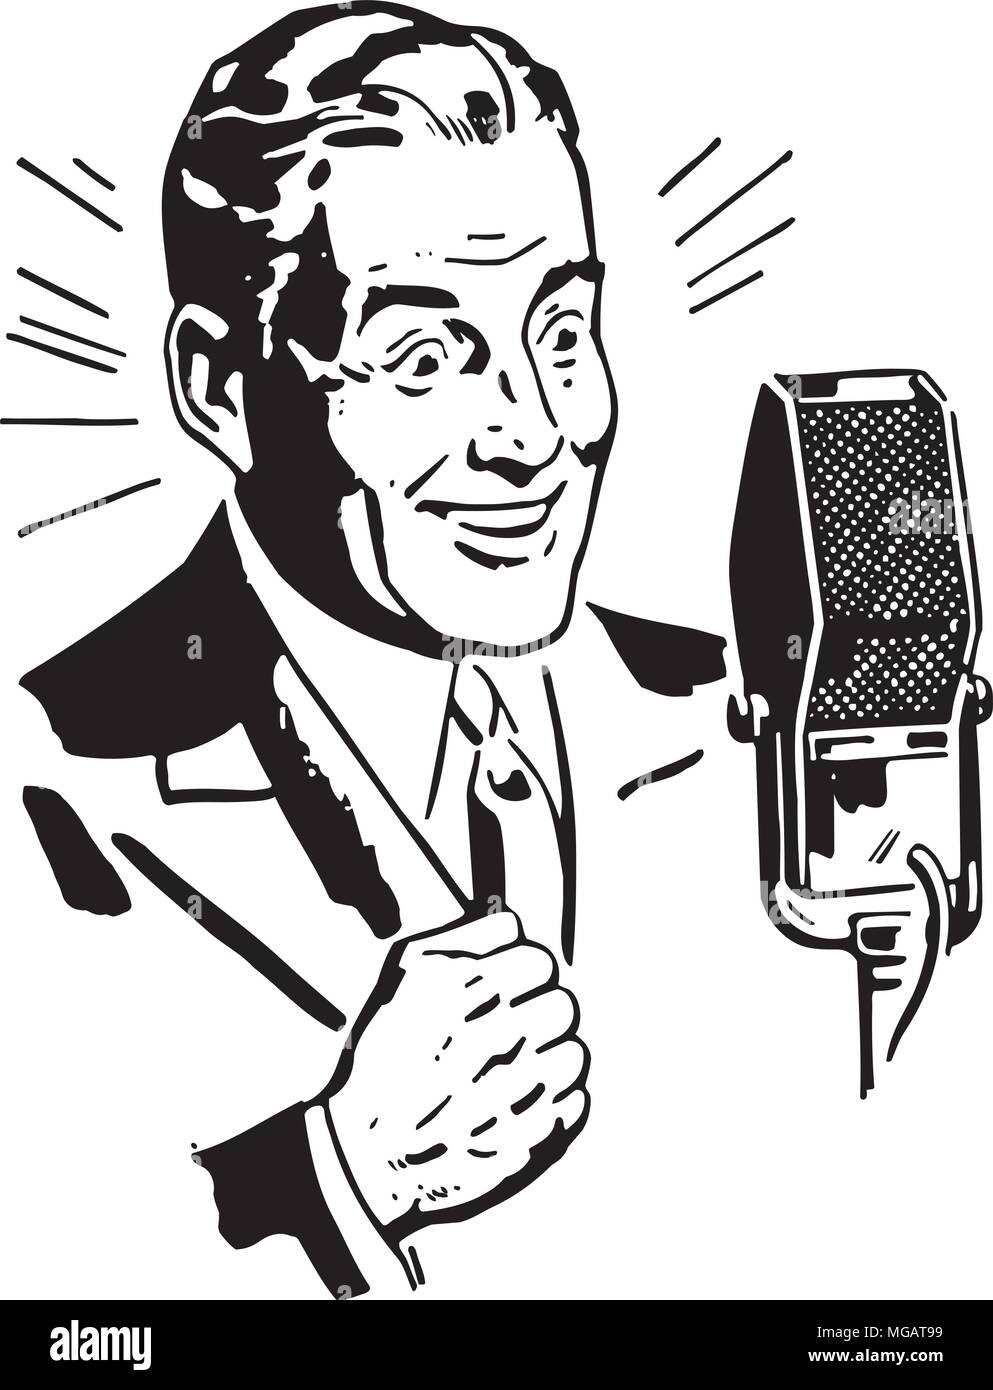 hight resolution of radio announcer 2 retro clipart illustration